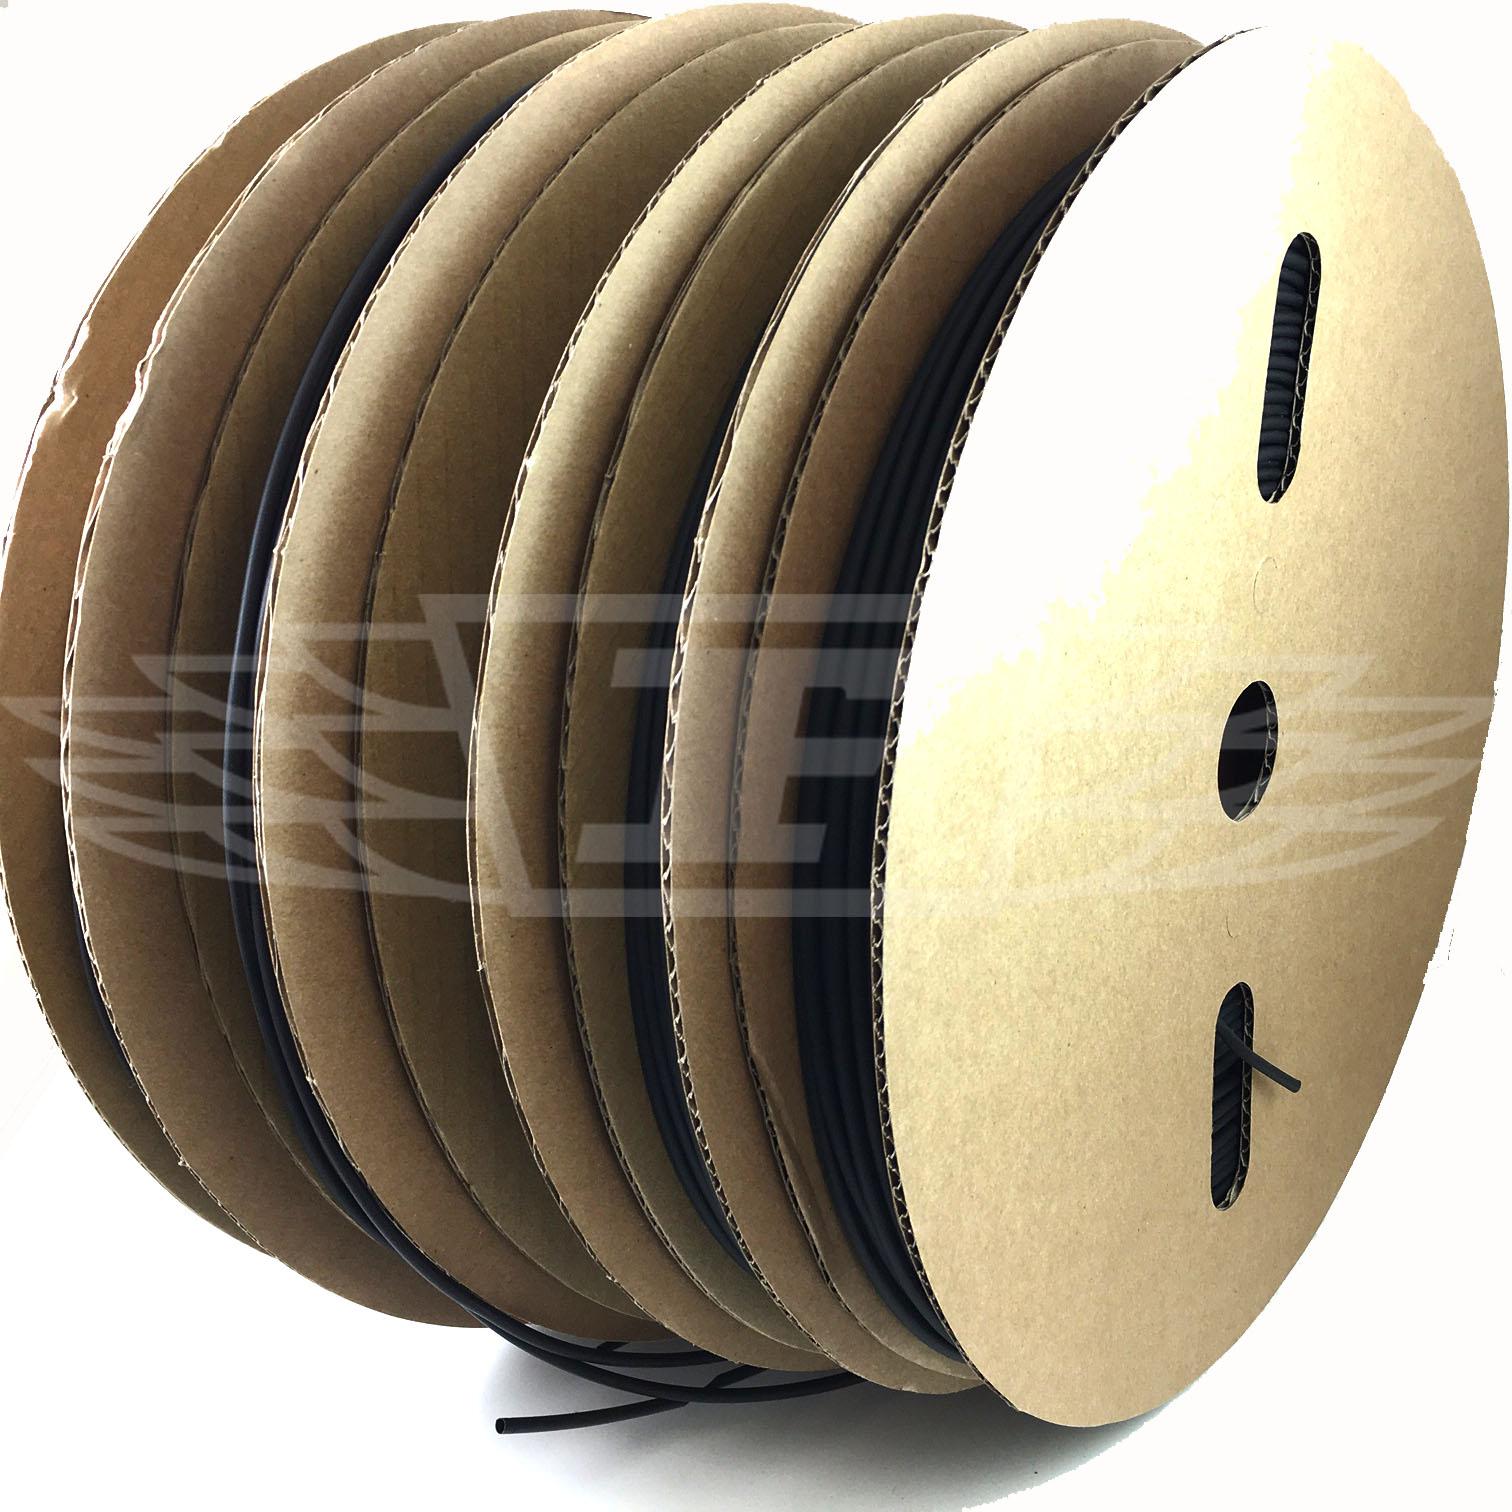 Shrink heat shrinkable sheath 1 metre-diameter 12,7mm Black